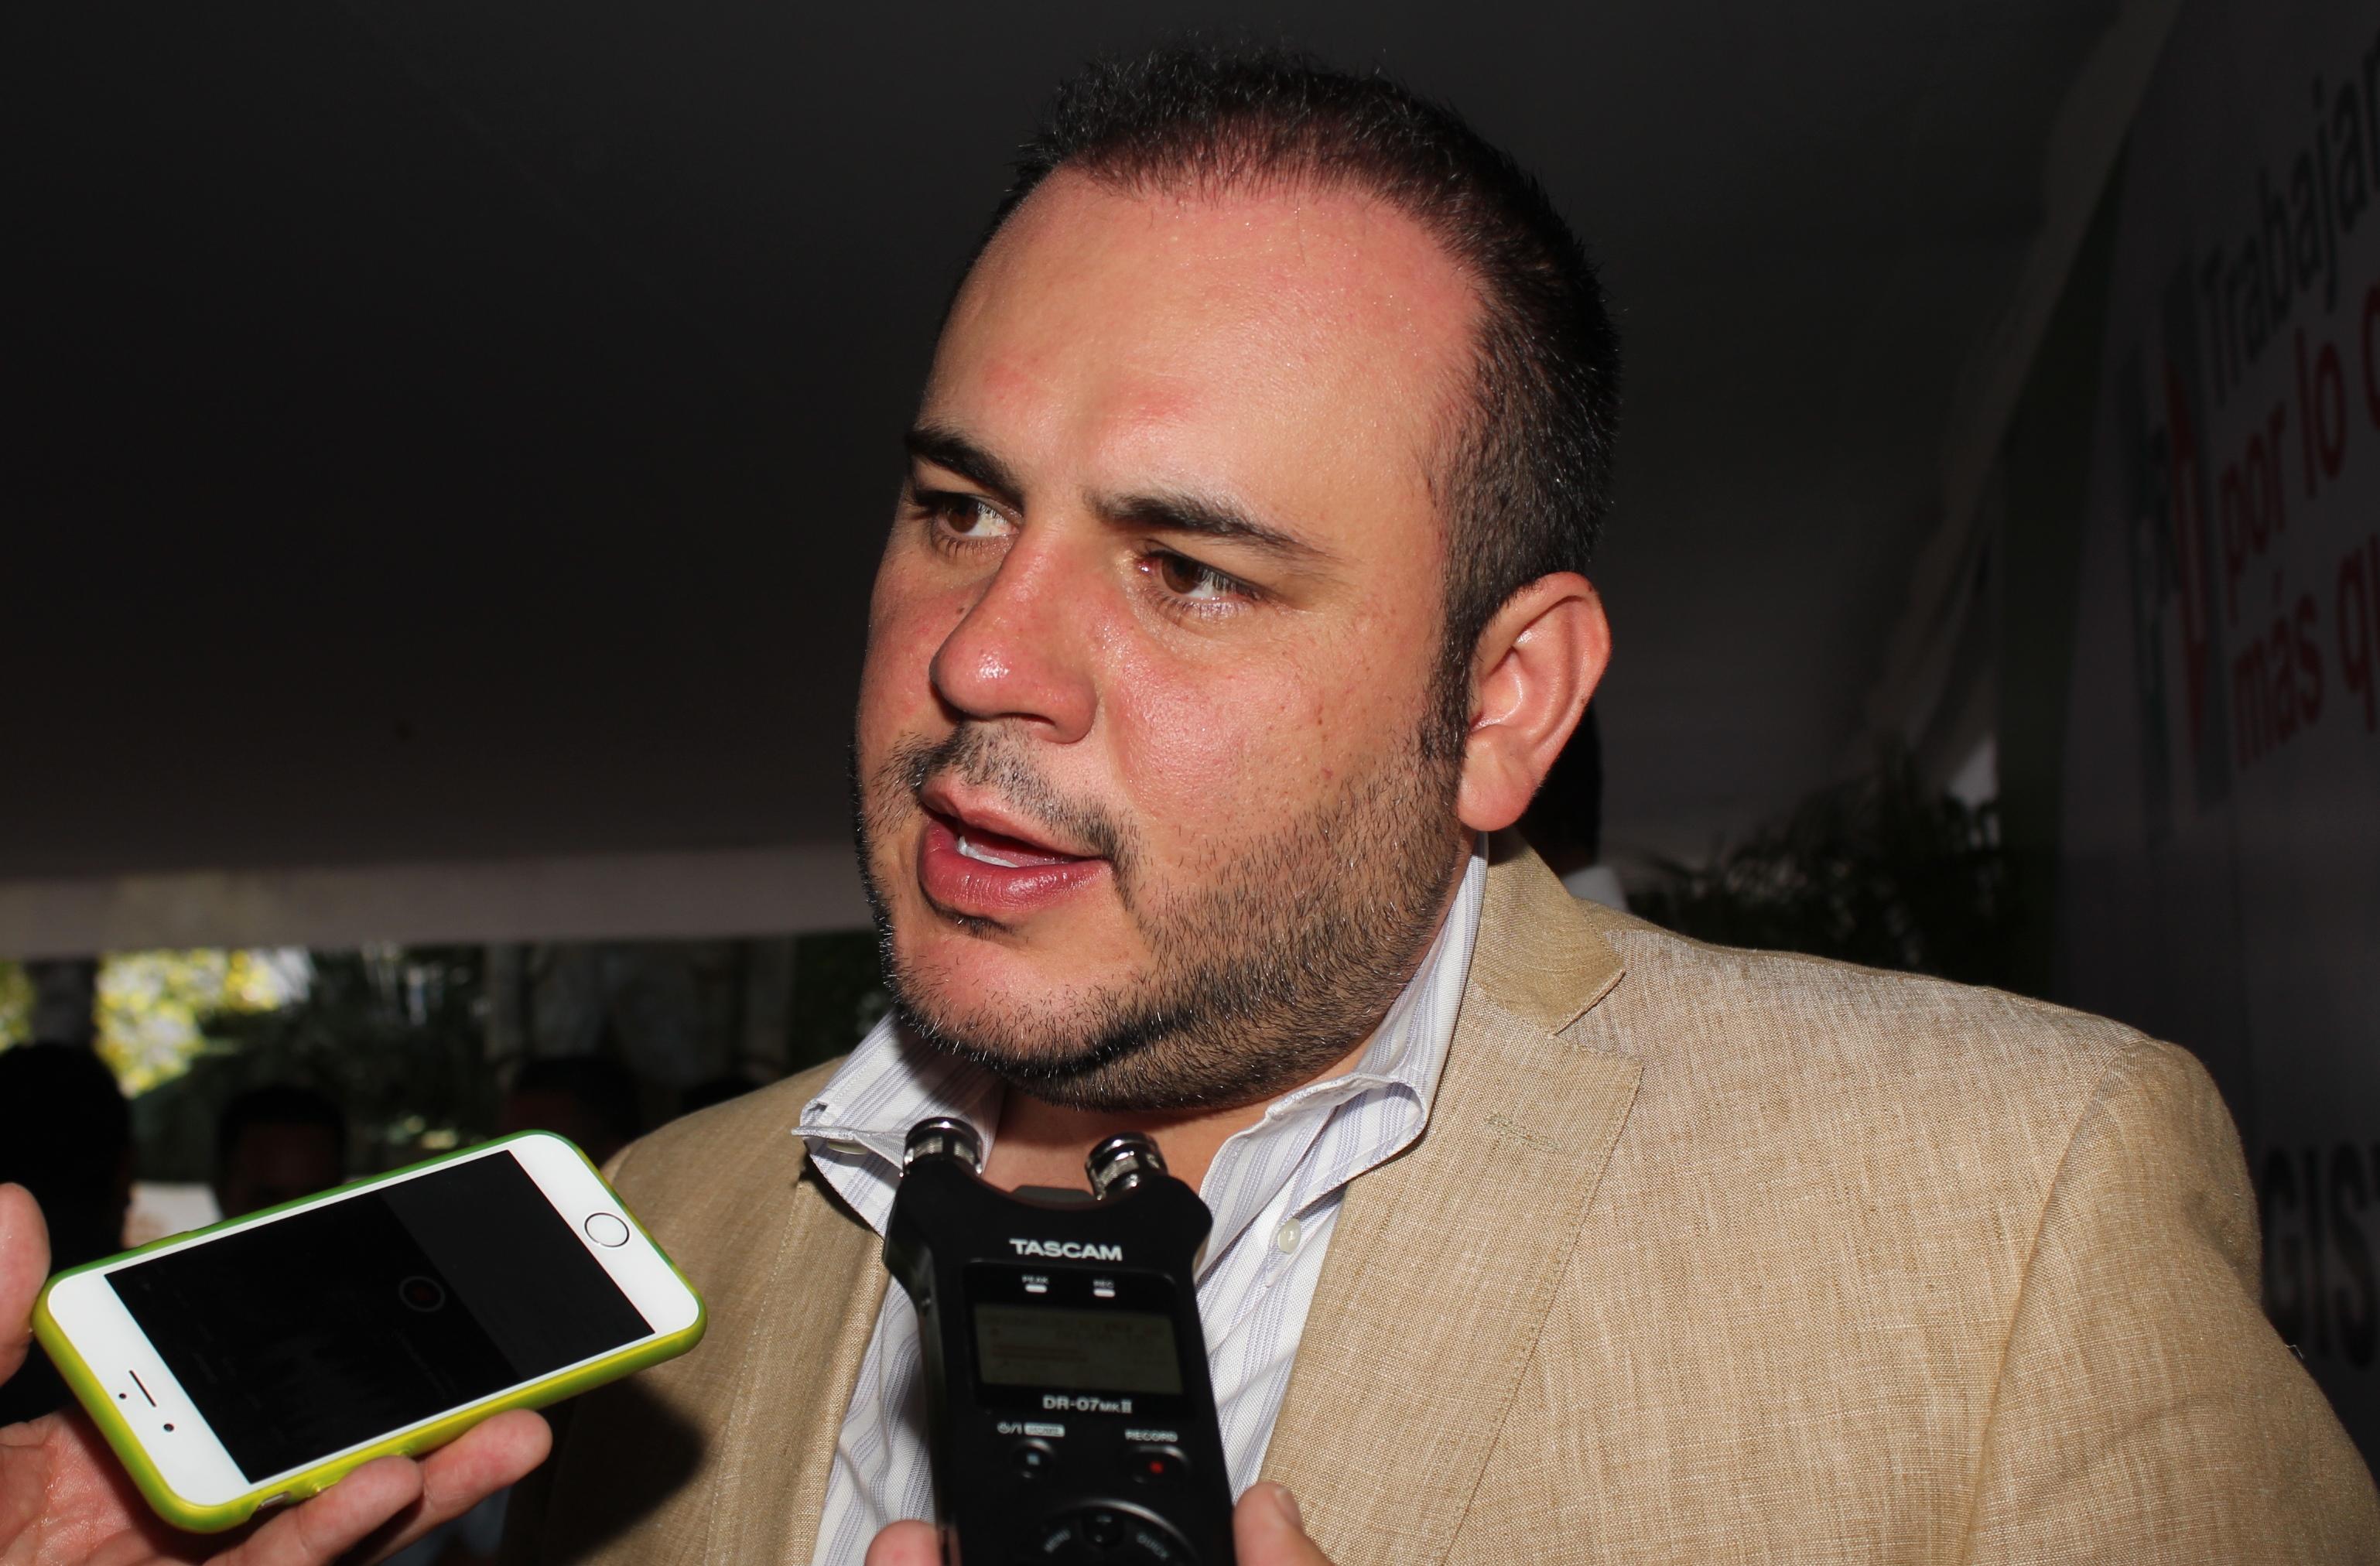 Orgullo priista / Paco Guel Saldívar